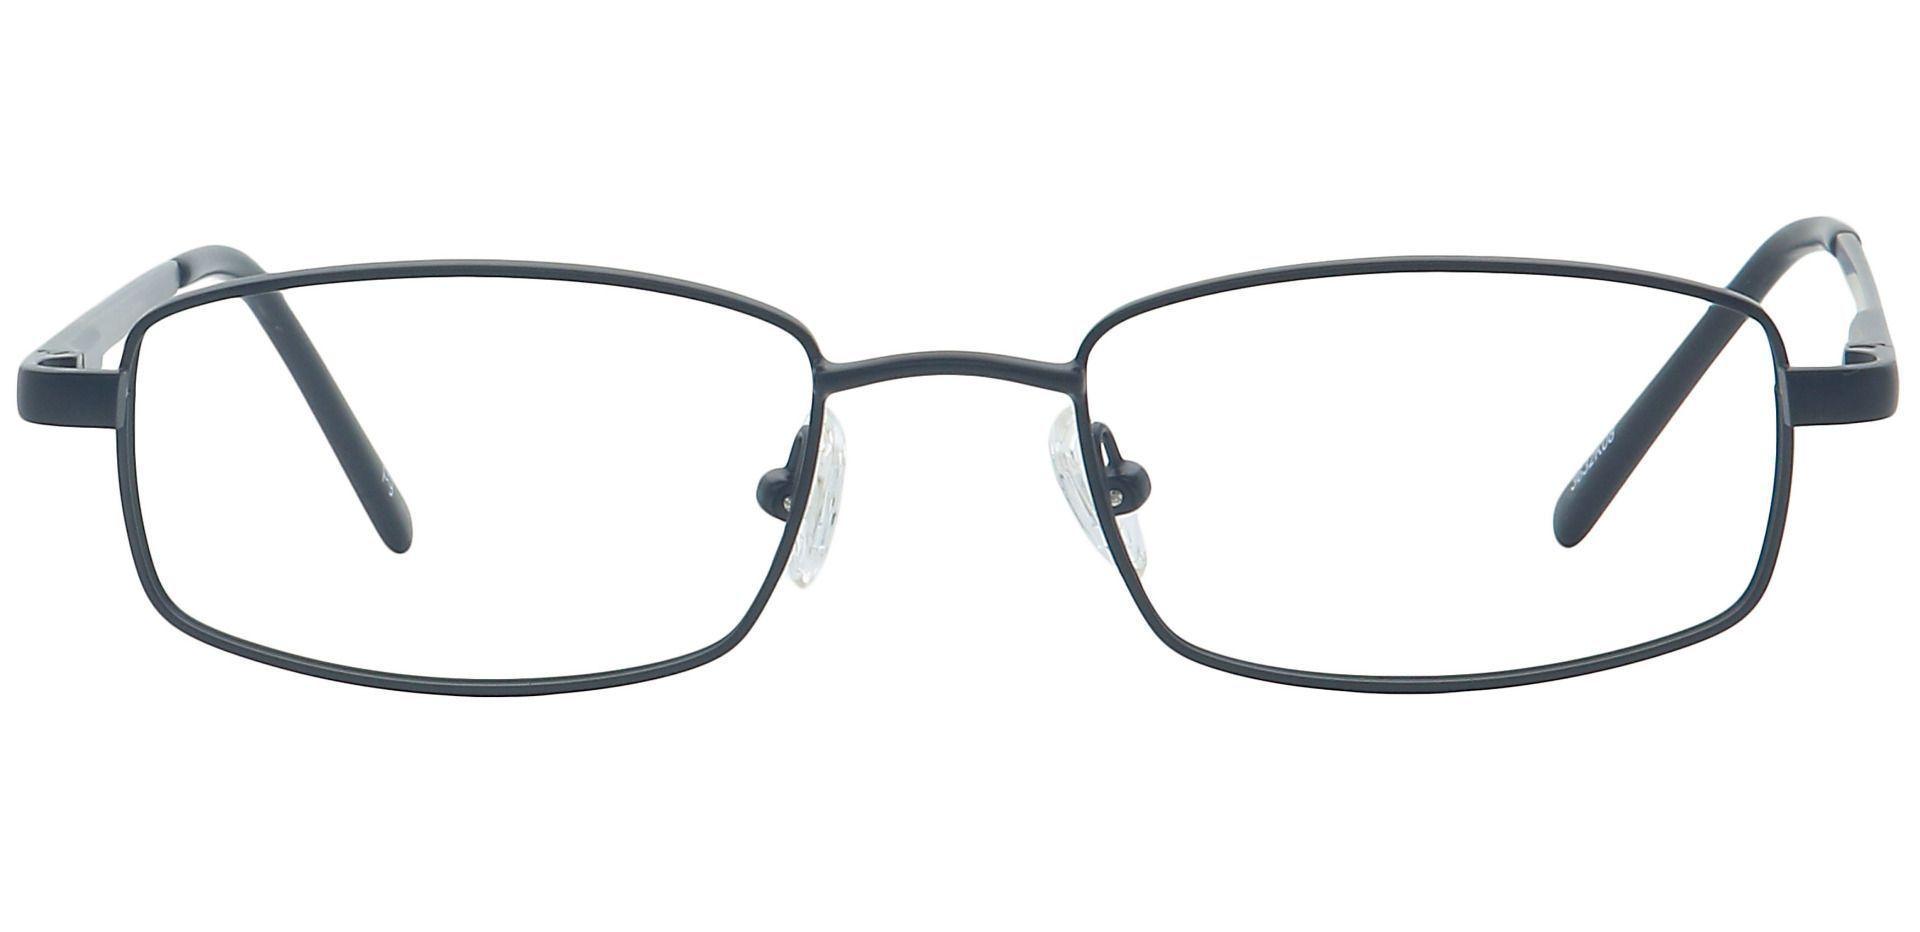 Sheldon Square Prescription Glasses - Black